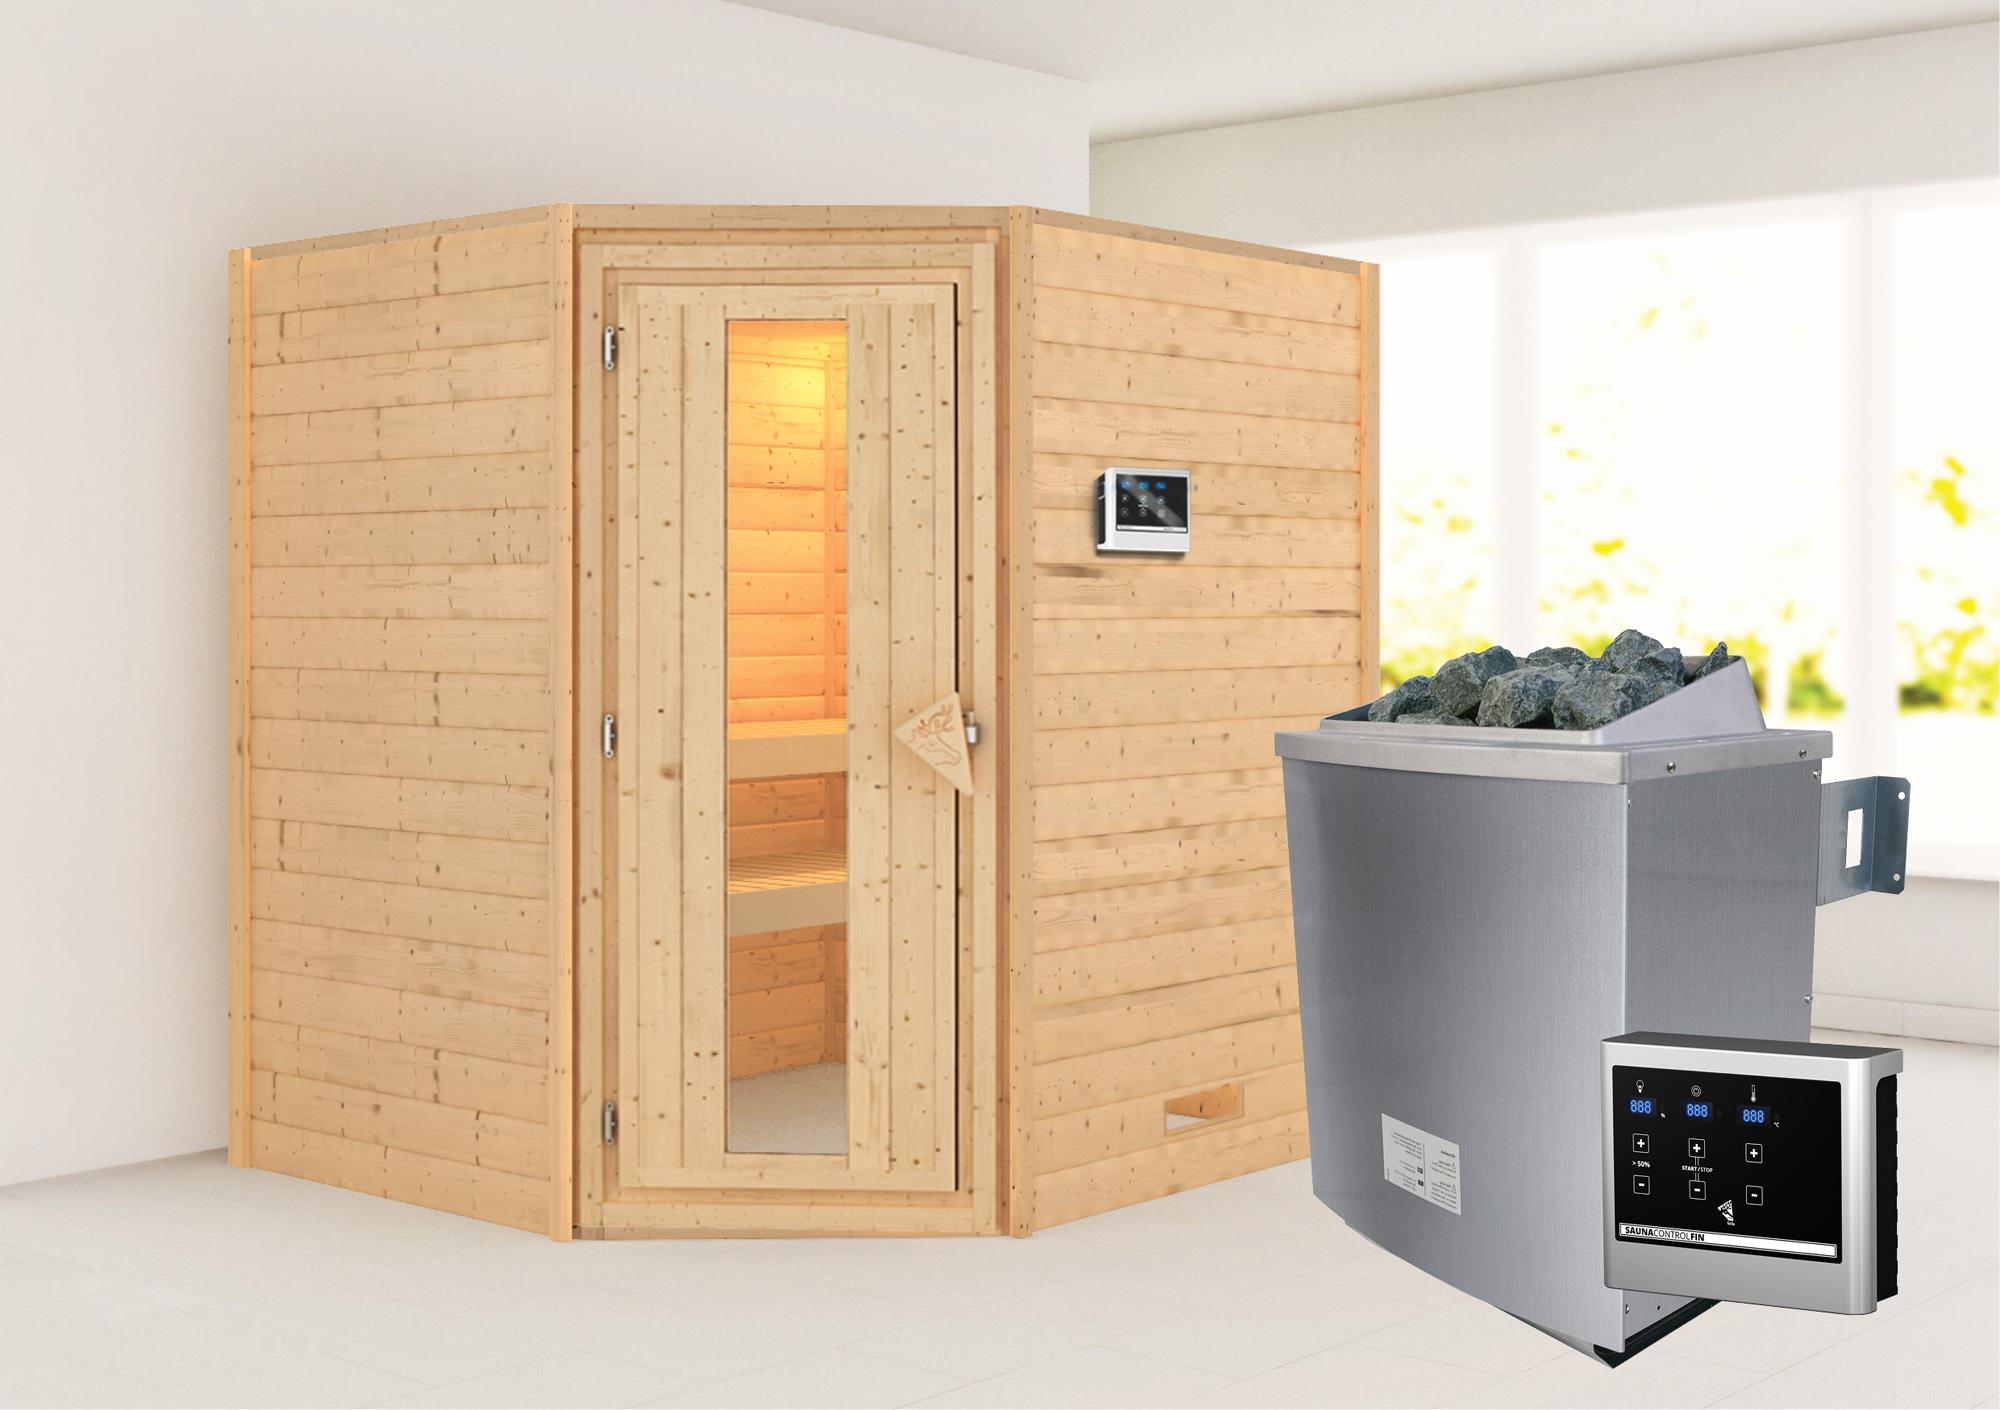 WoodFeeling Sauna Mia 38mm Saunaofen 9kW extern Holztür Bild 1